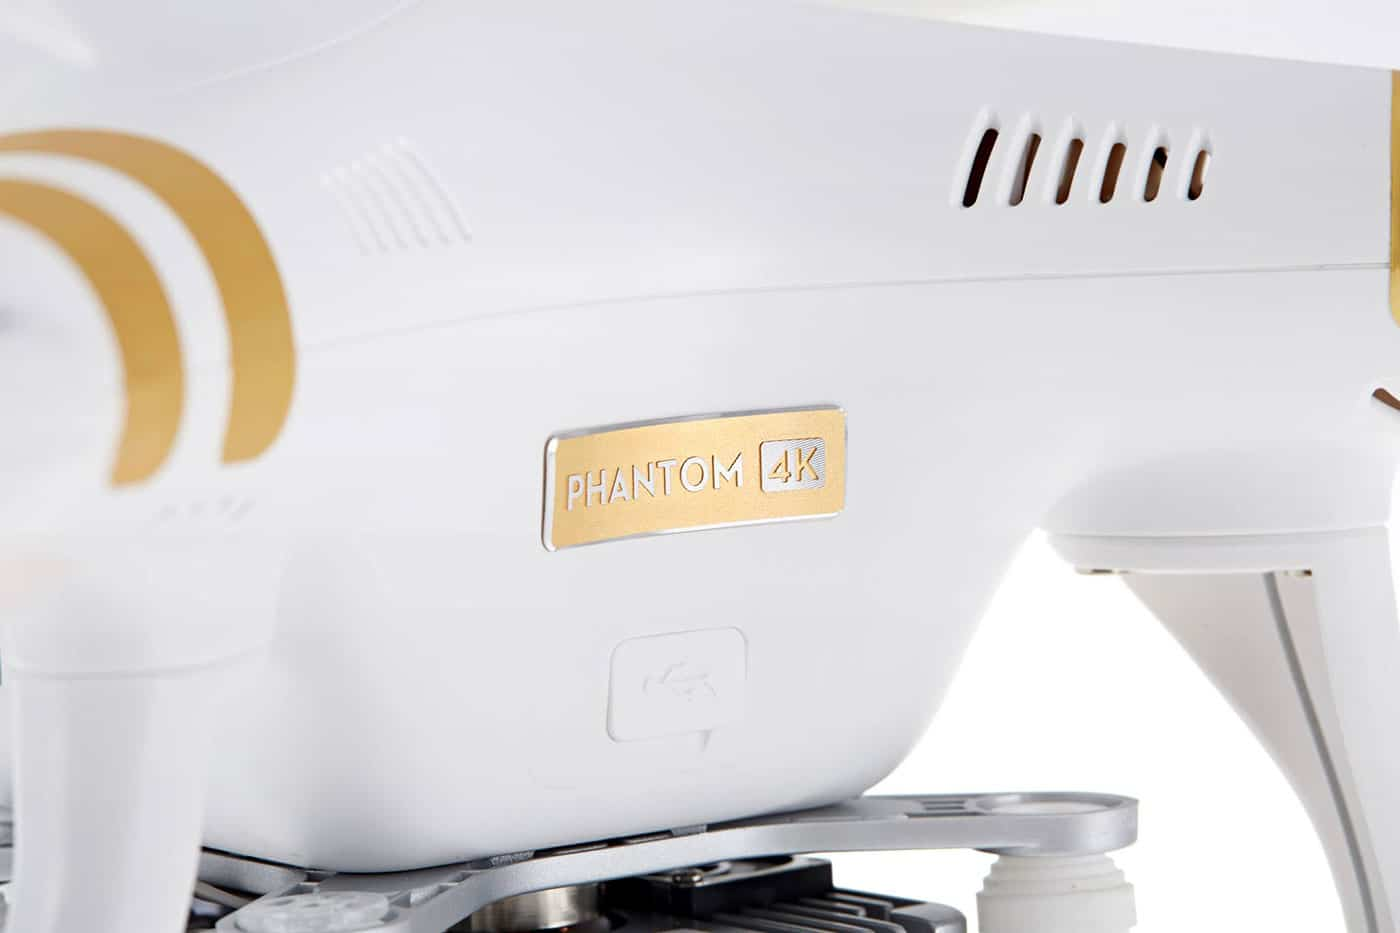 DJI Phantom 3 4K-Drohne